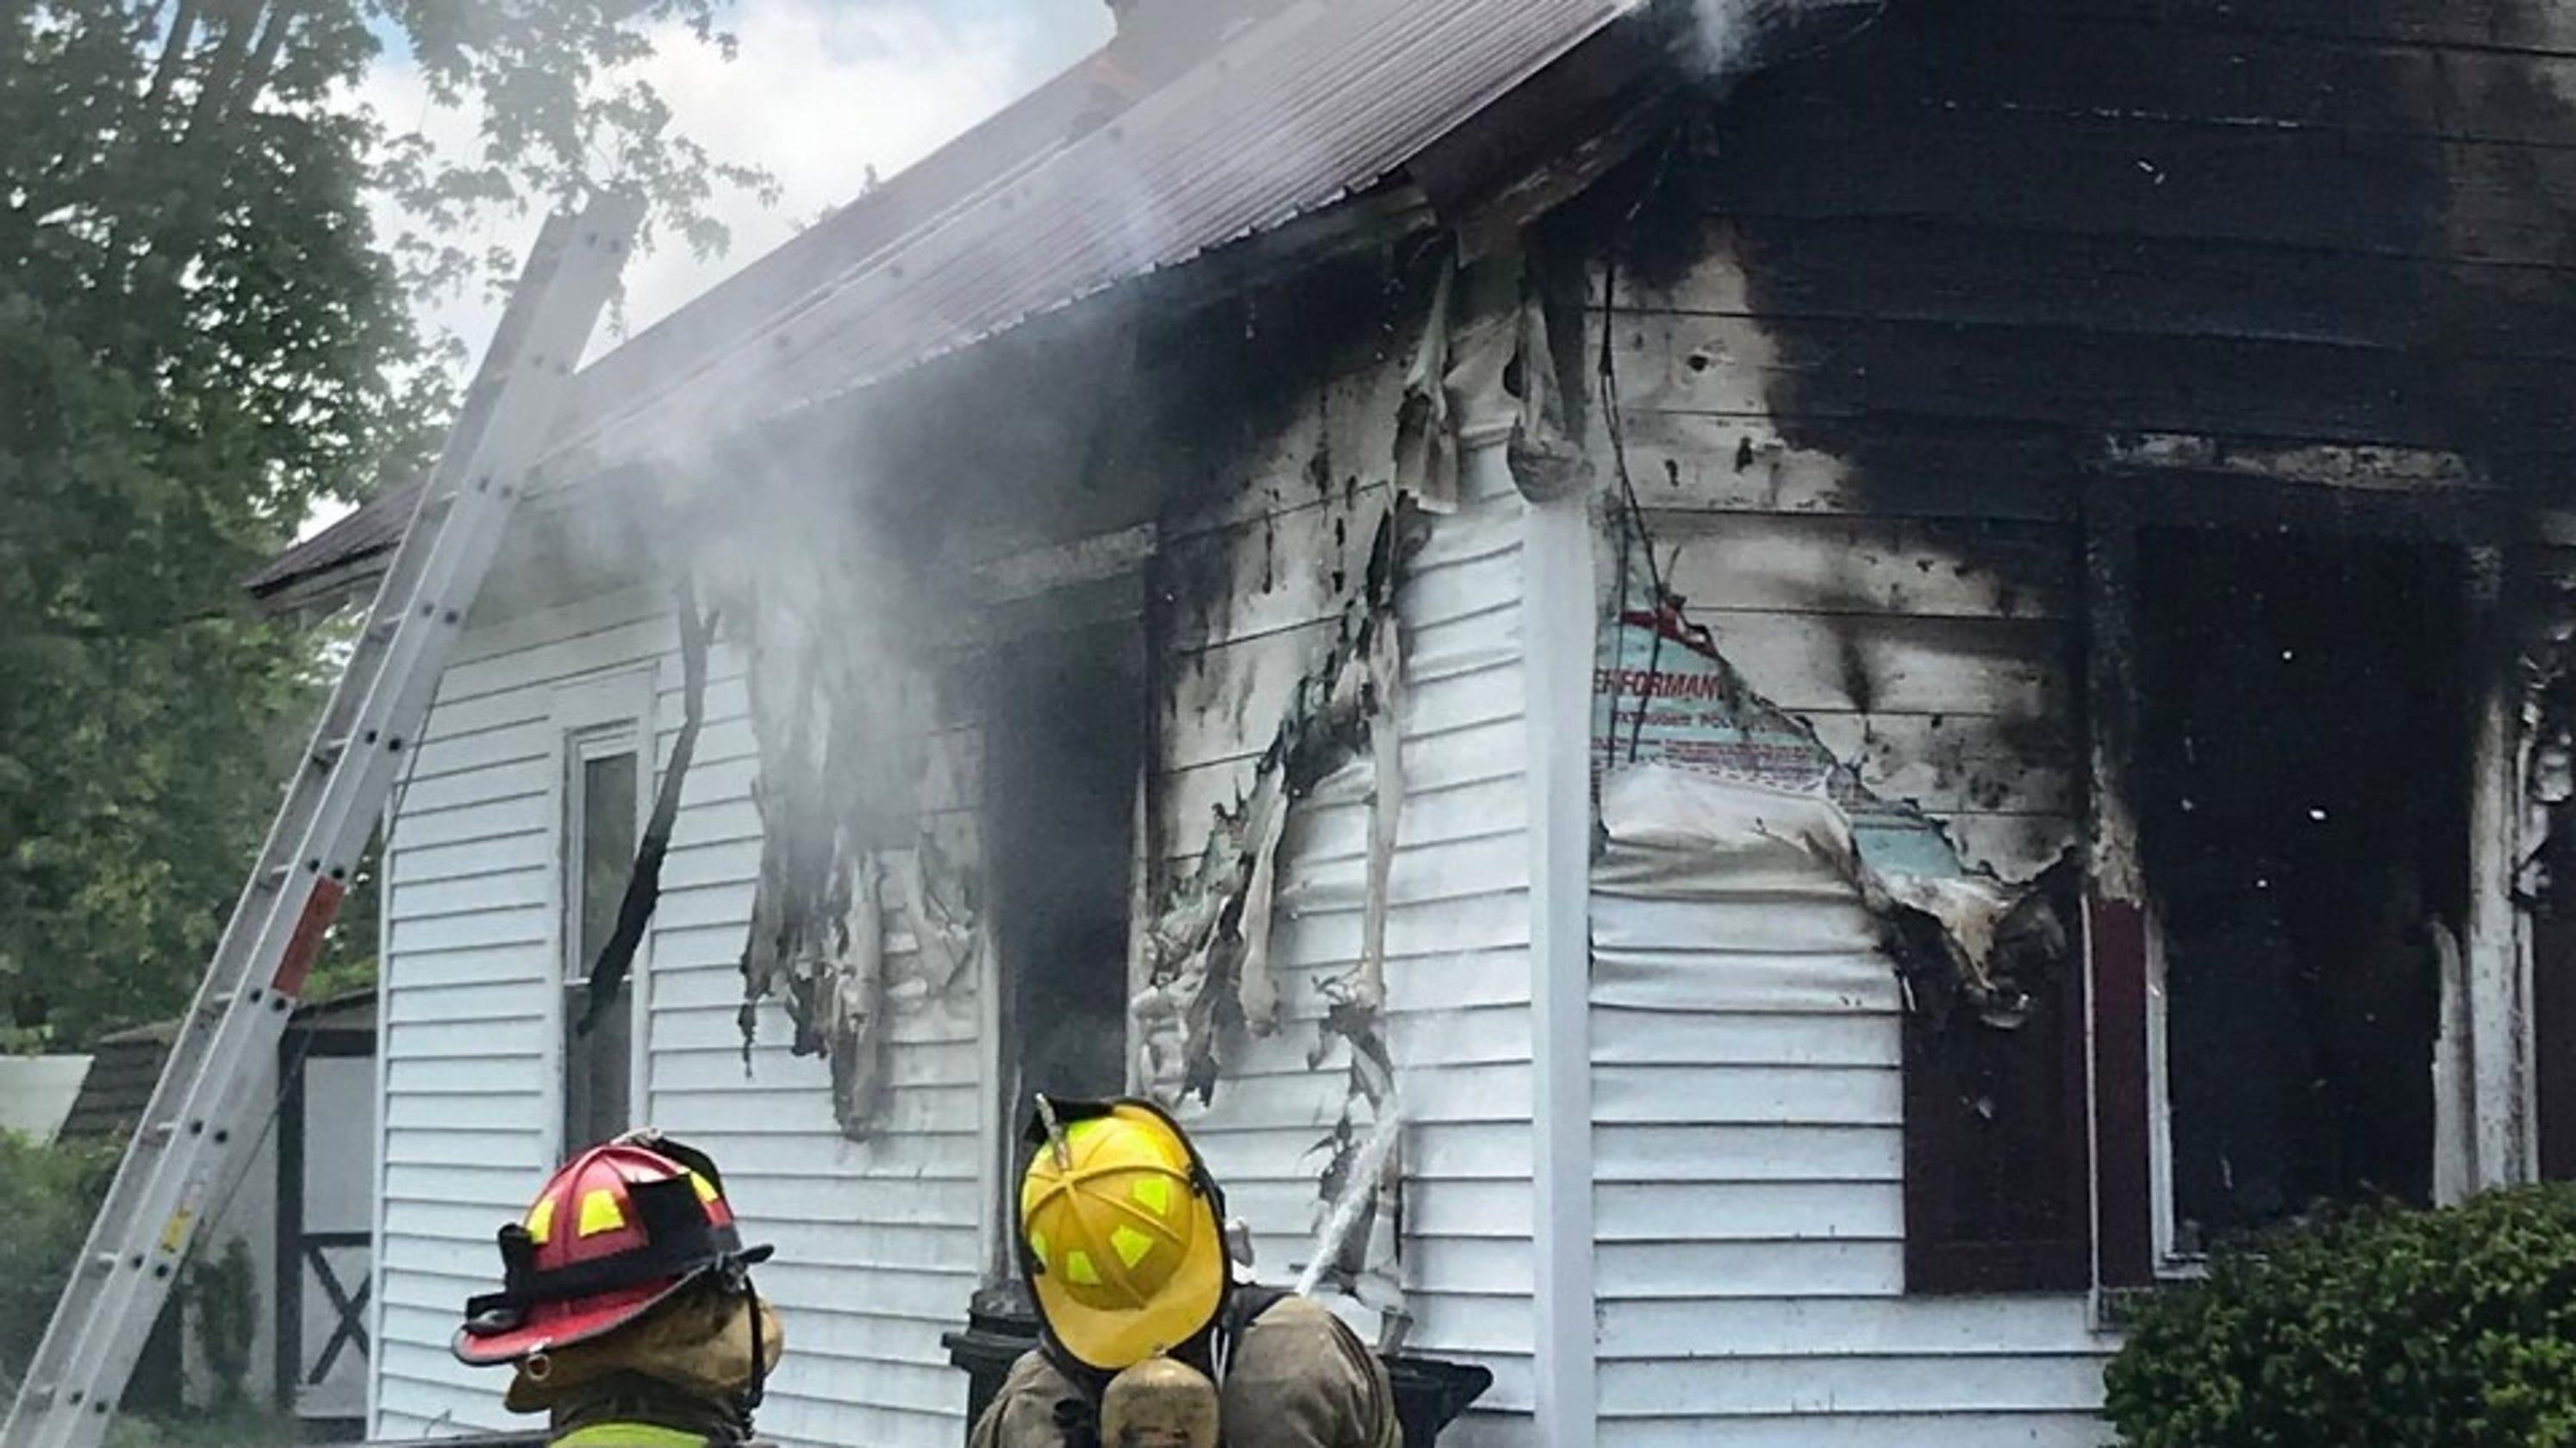 Fire ravages Onancock home: Accomack